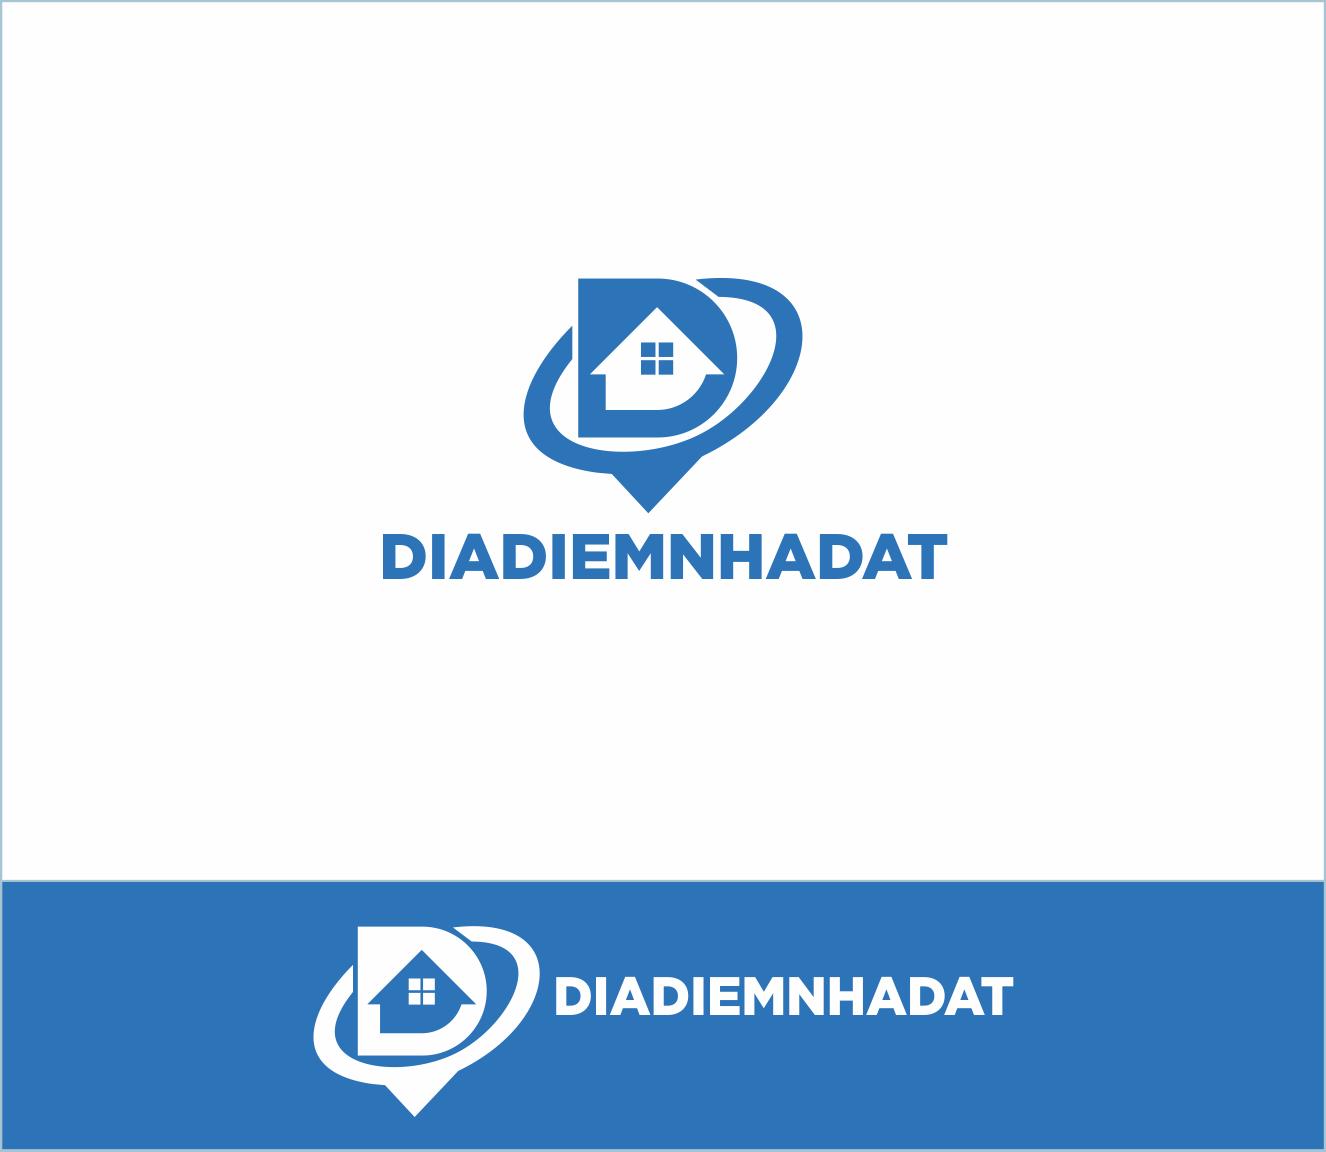 Logo Design by Armada Jamaluddin - Entry No. 77 in the Logo Design Contest New Logo Design for DIADIEMNHADAT.